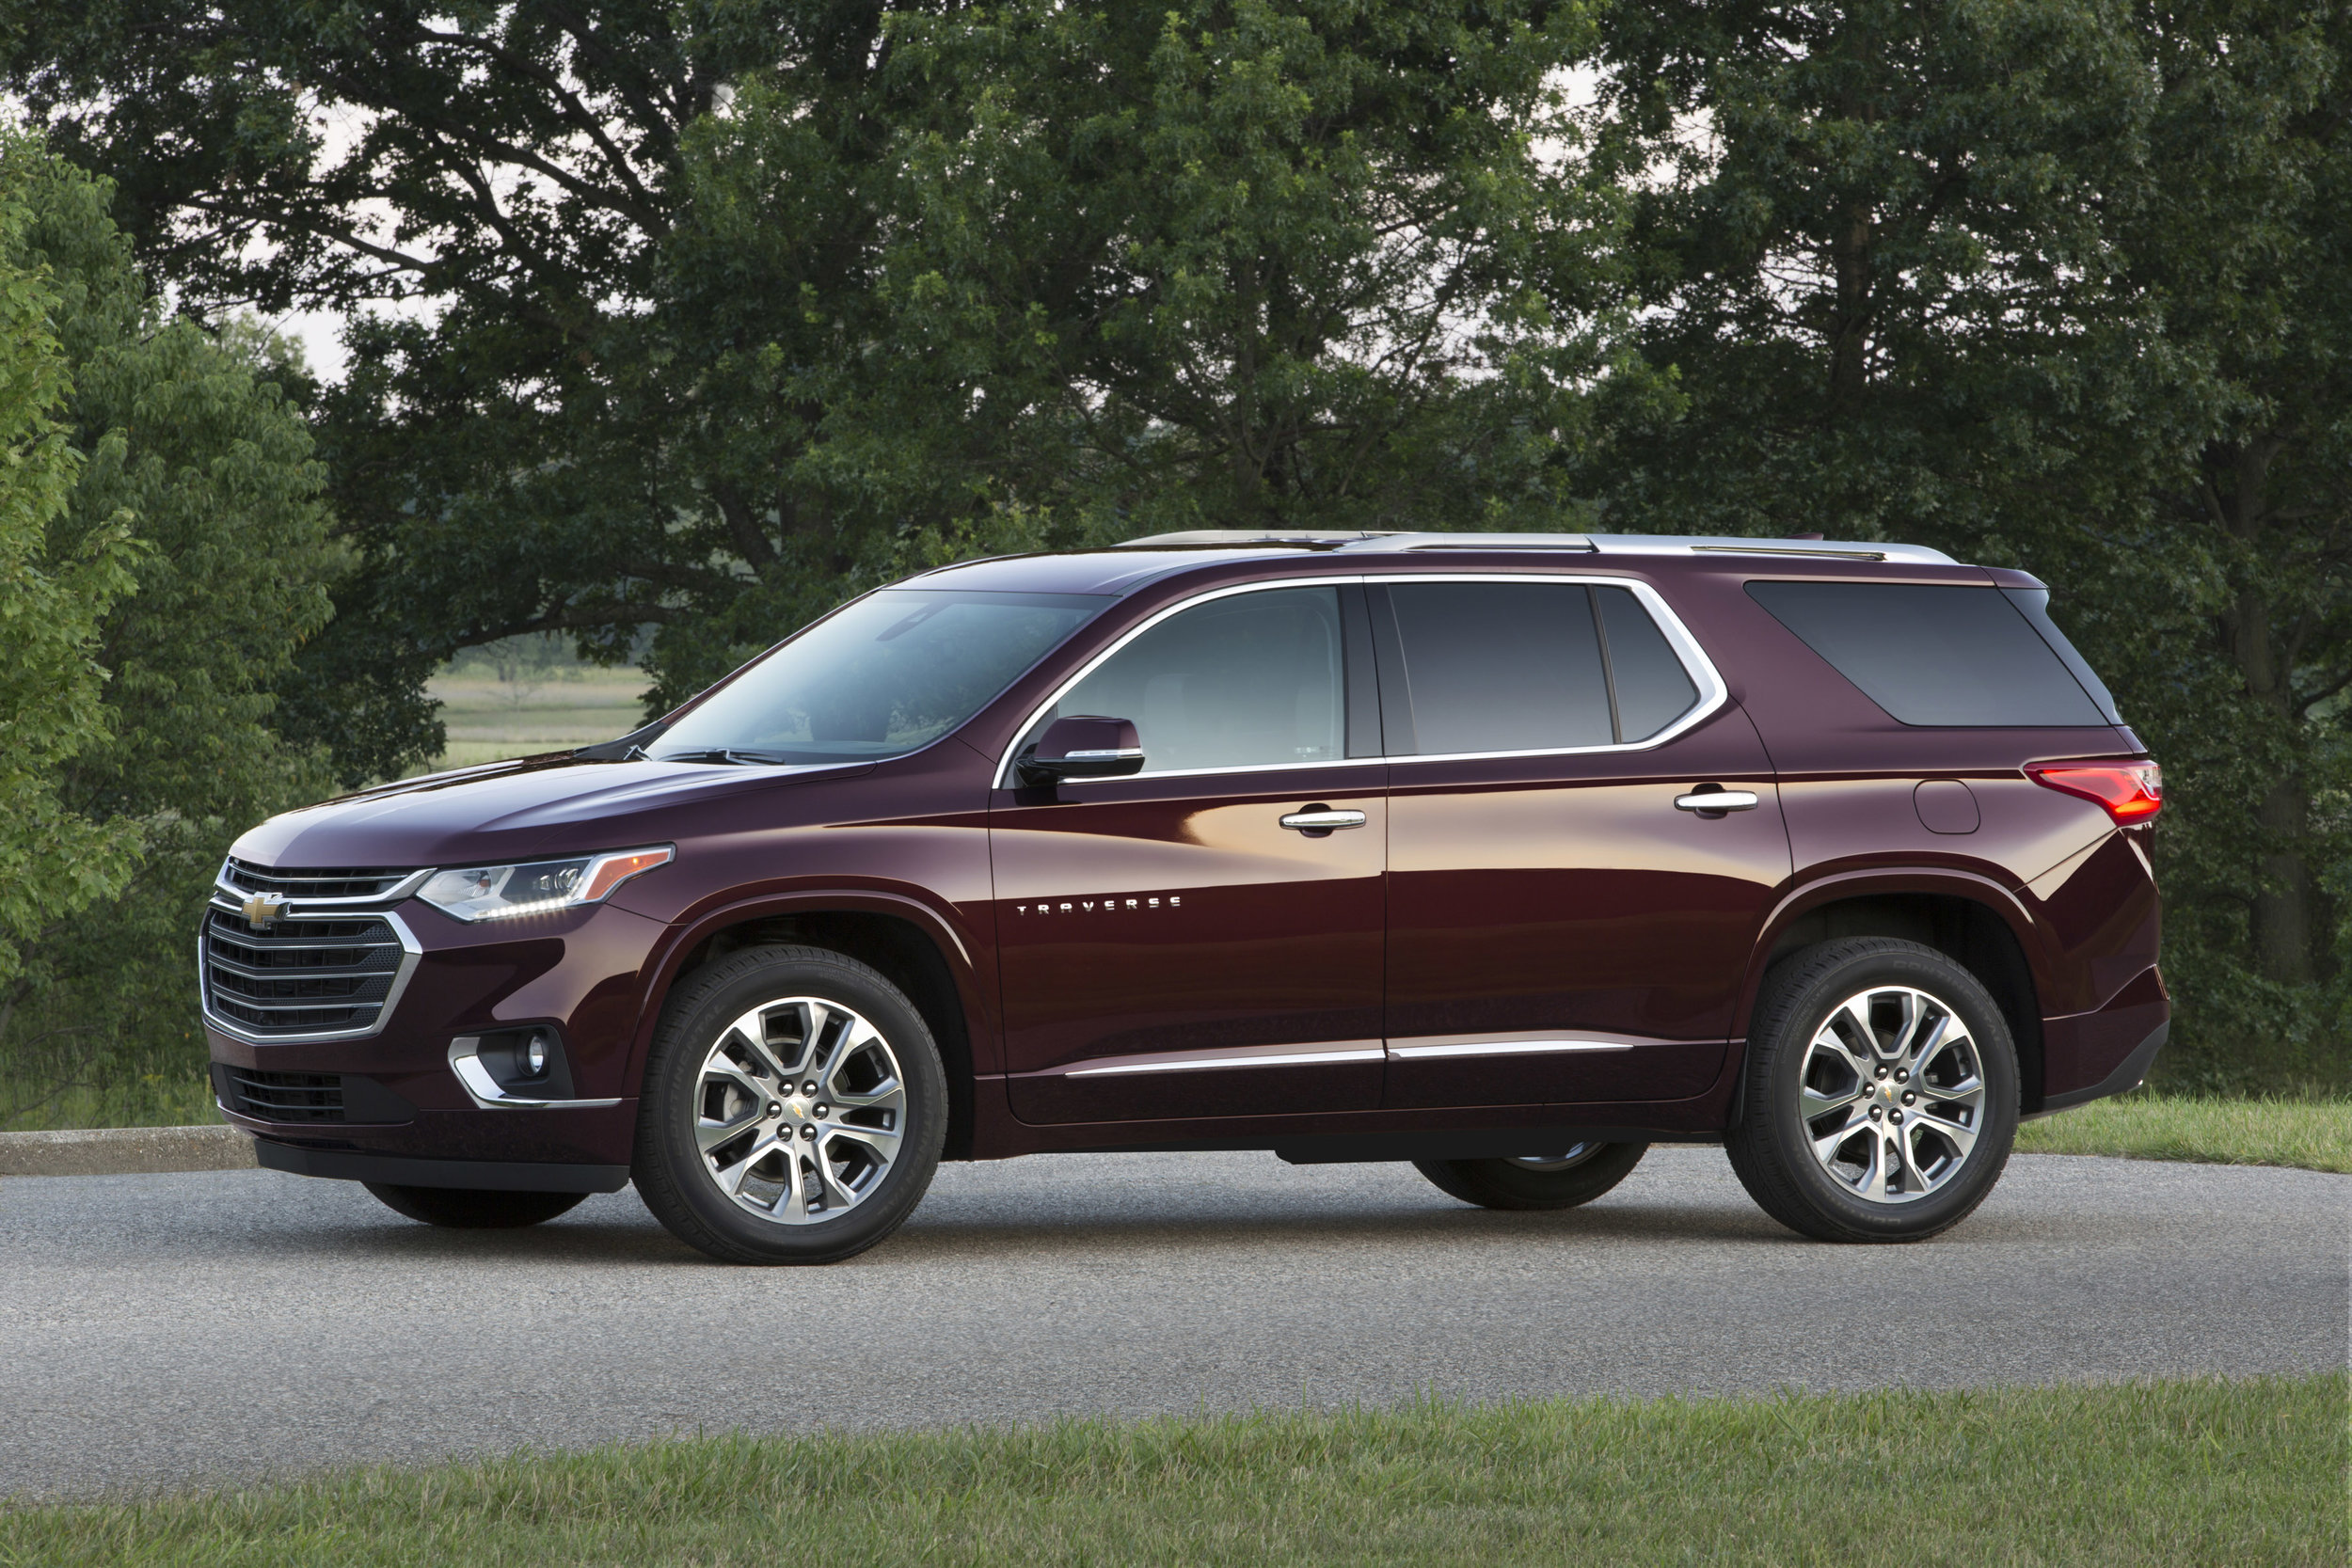 2018-Chevrolet-Traverse-057.jpg